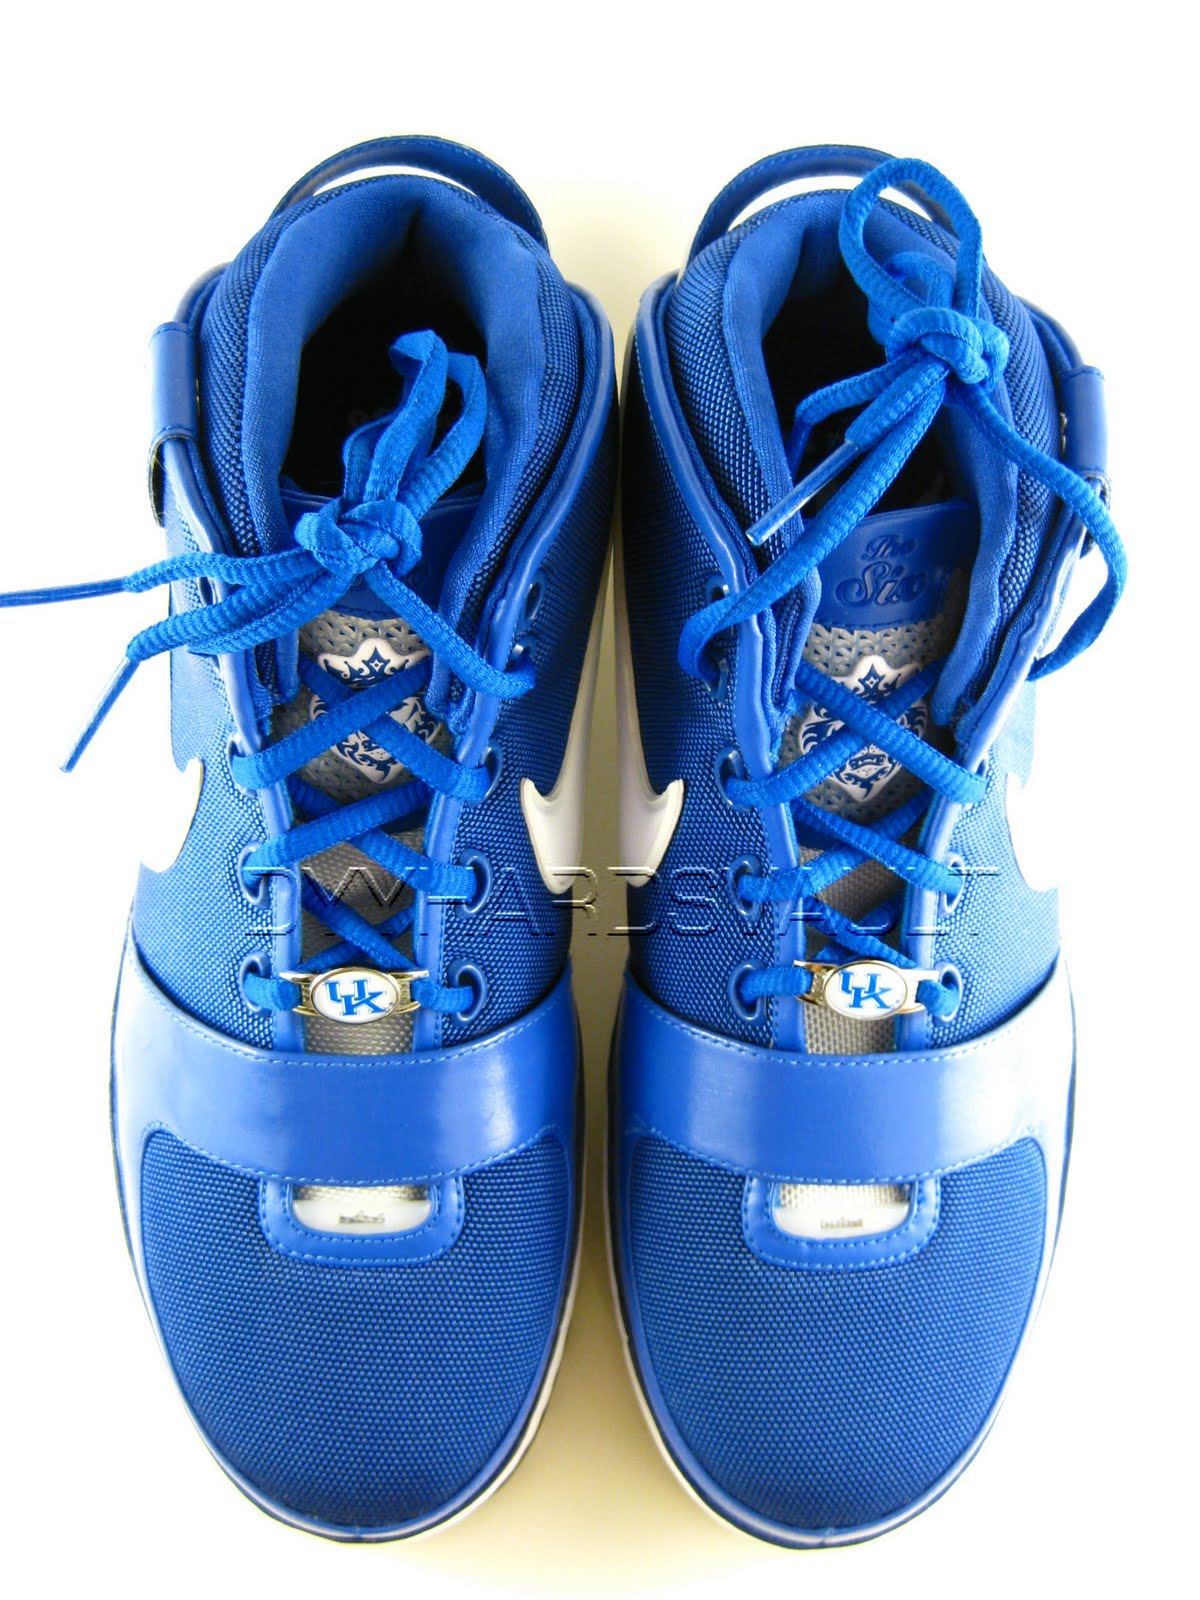 Kentucky Wildcats Shoe Laces